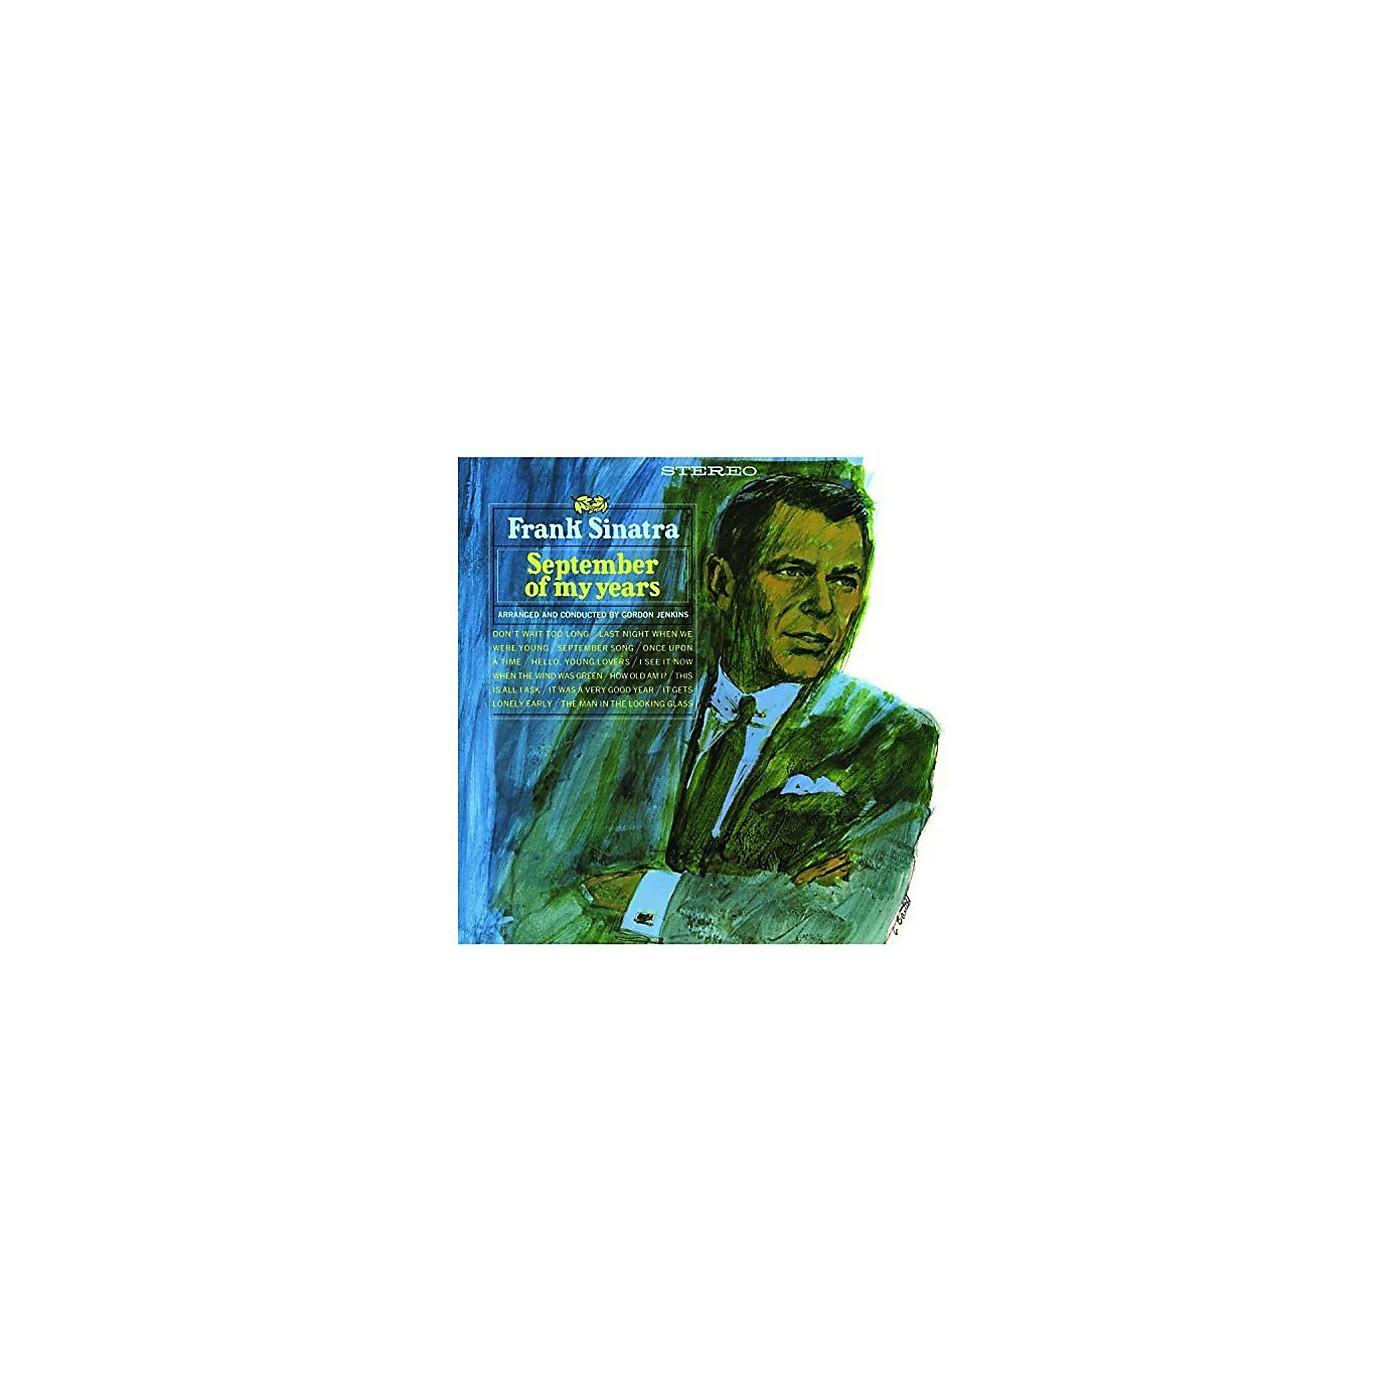 Alliance Frank Sinatra - September of My Years thumbnail